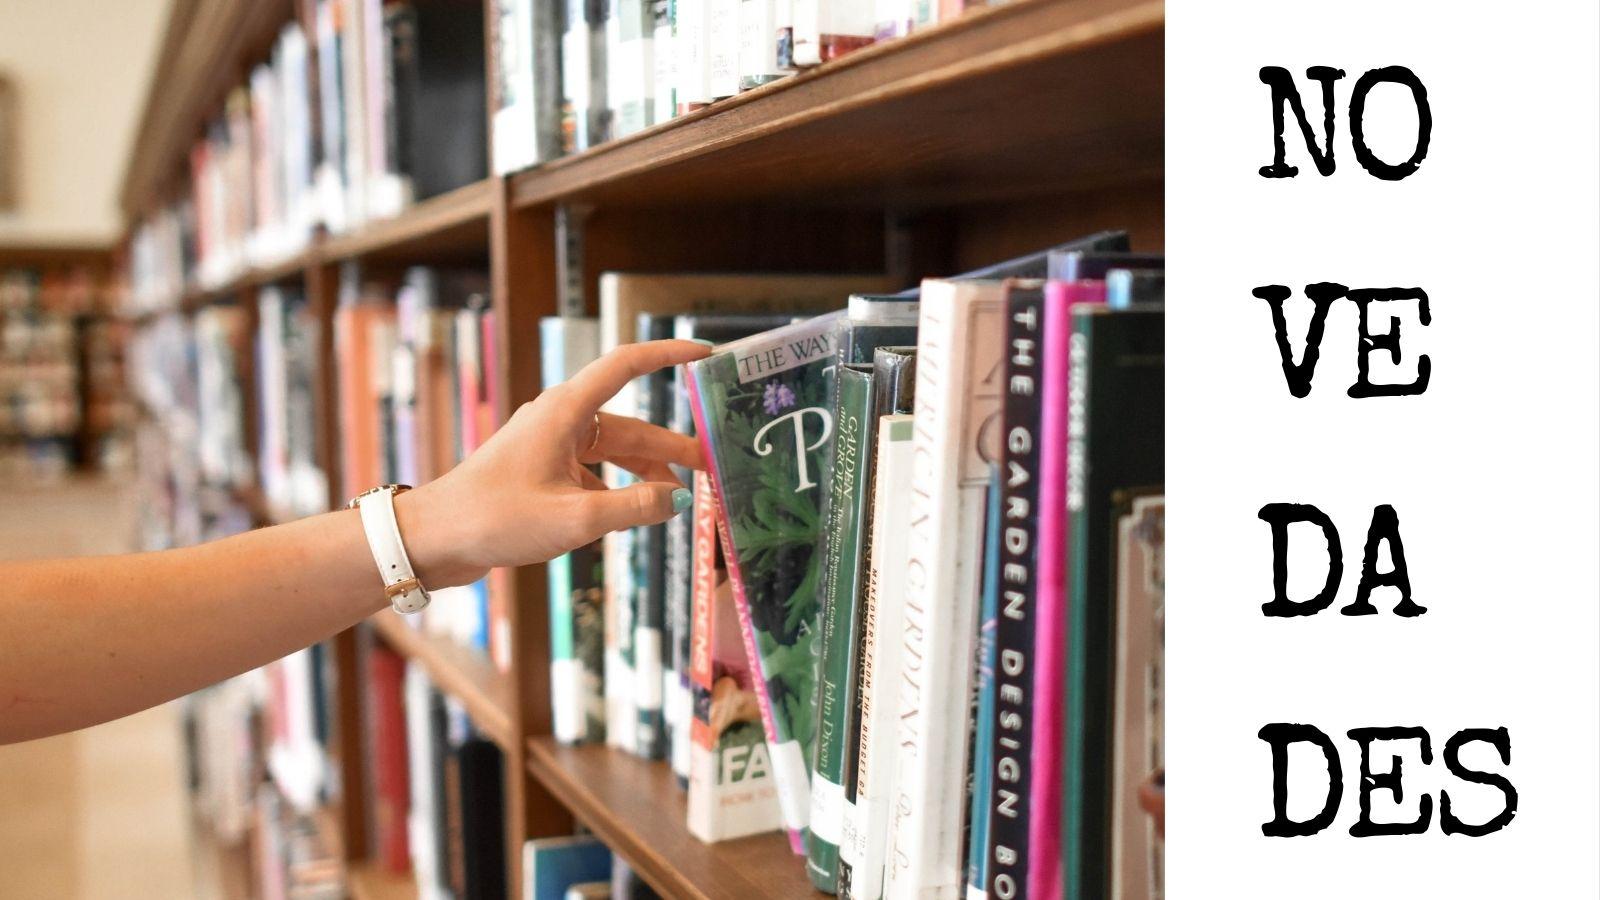 La biblioteca municipal renueva su fondo bibliográfico